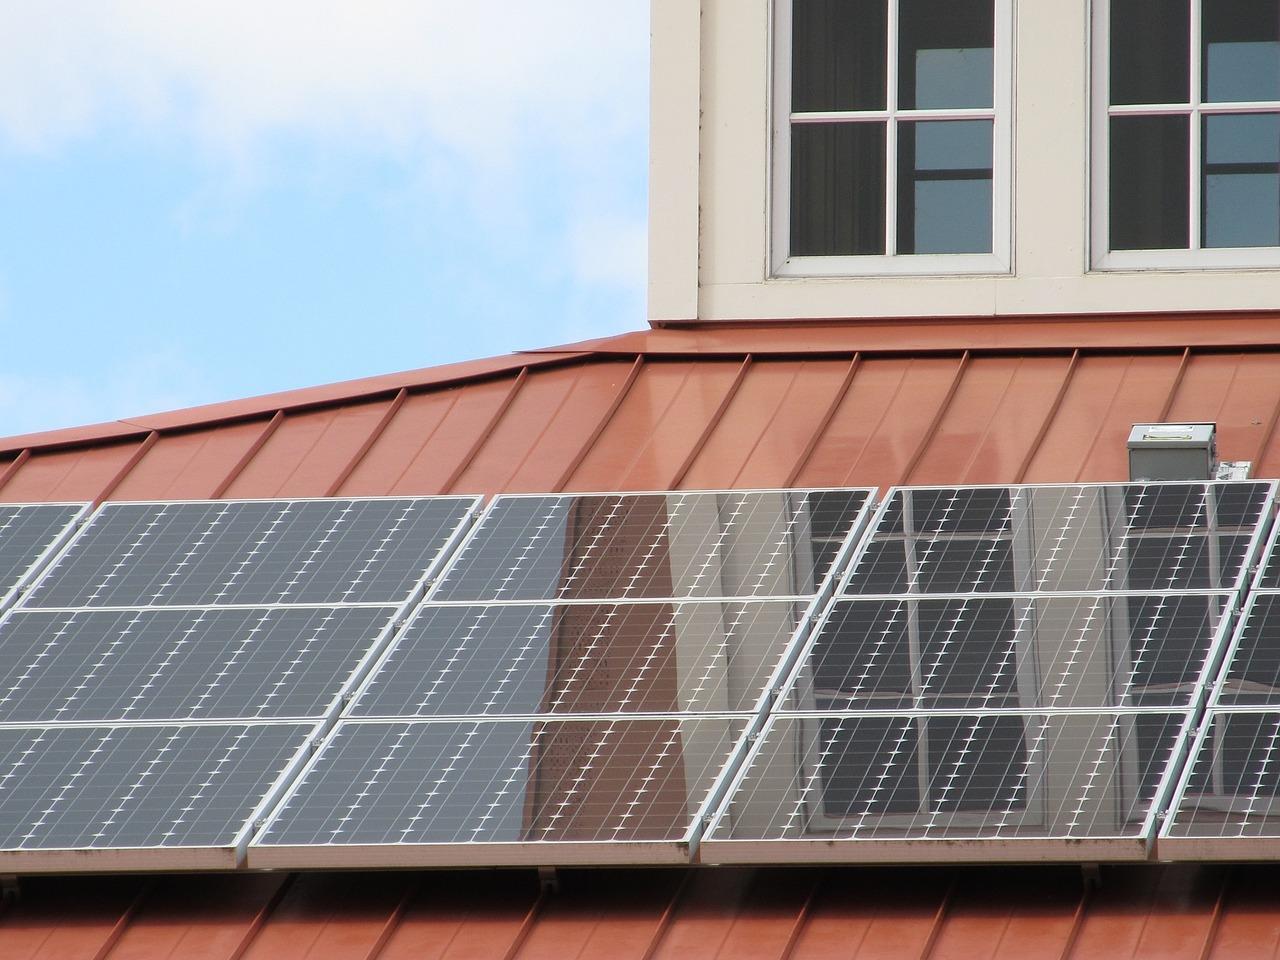 solar-panel-array-1794514_1280-1503161164379-1503161166658.jpg